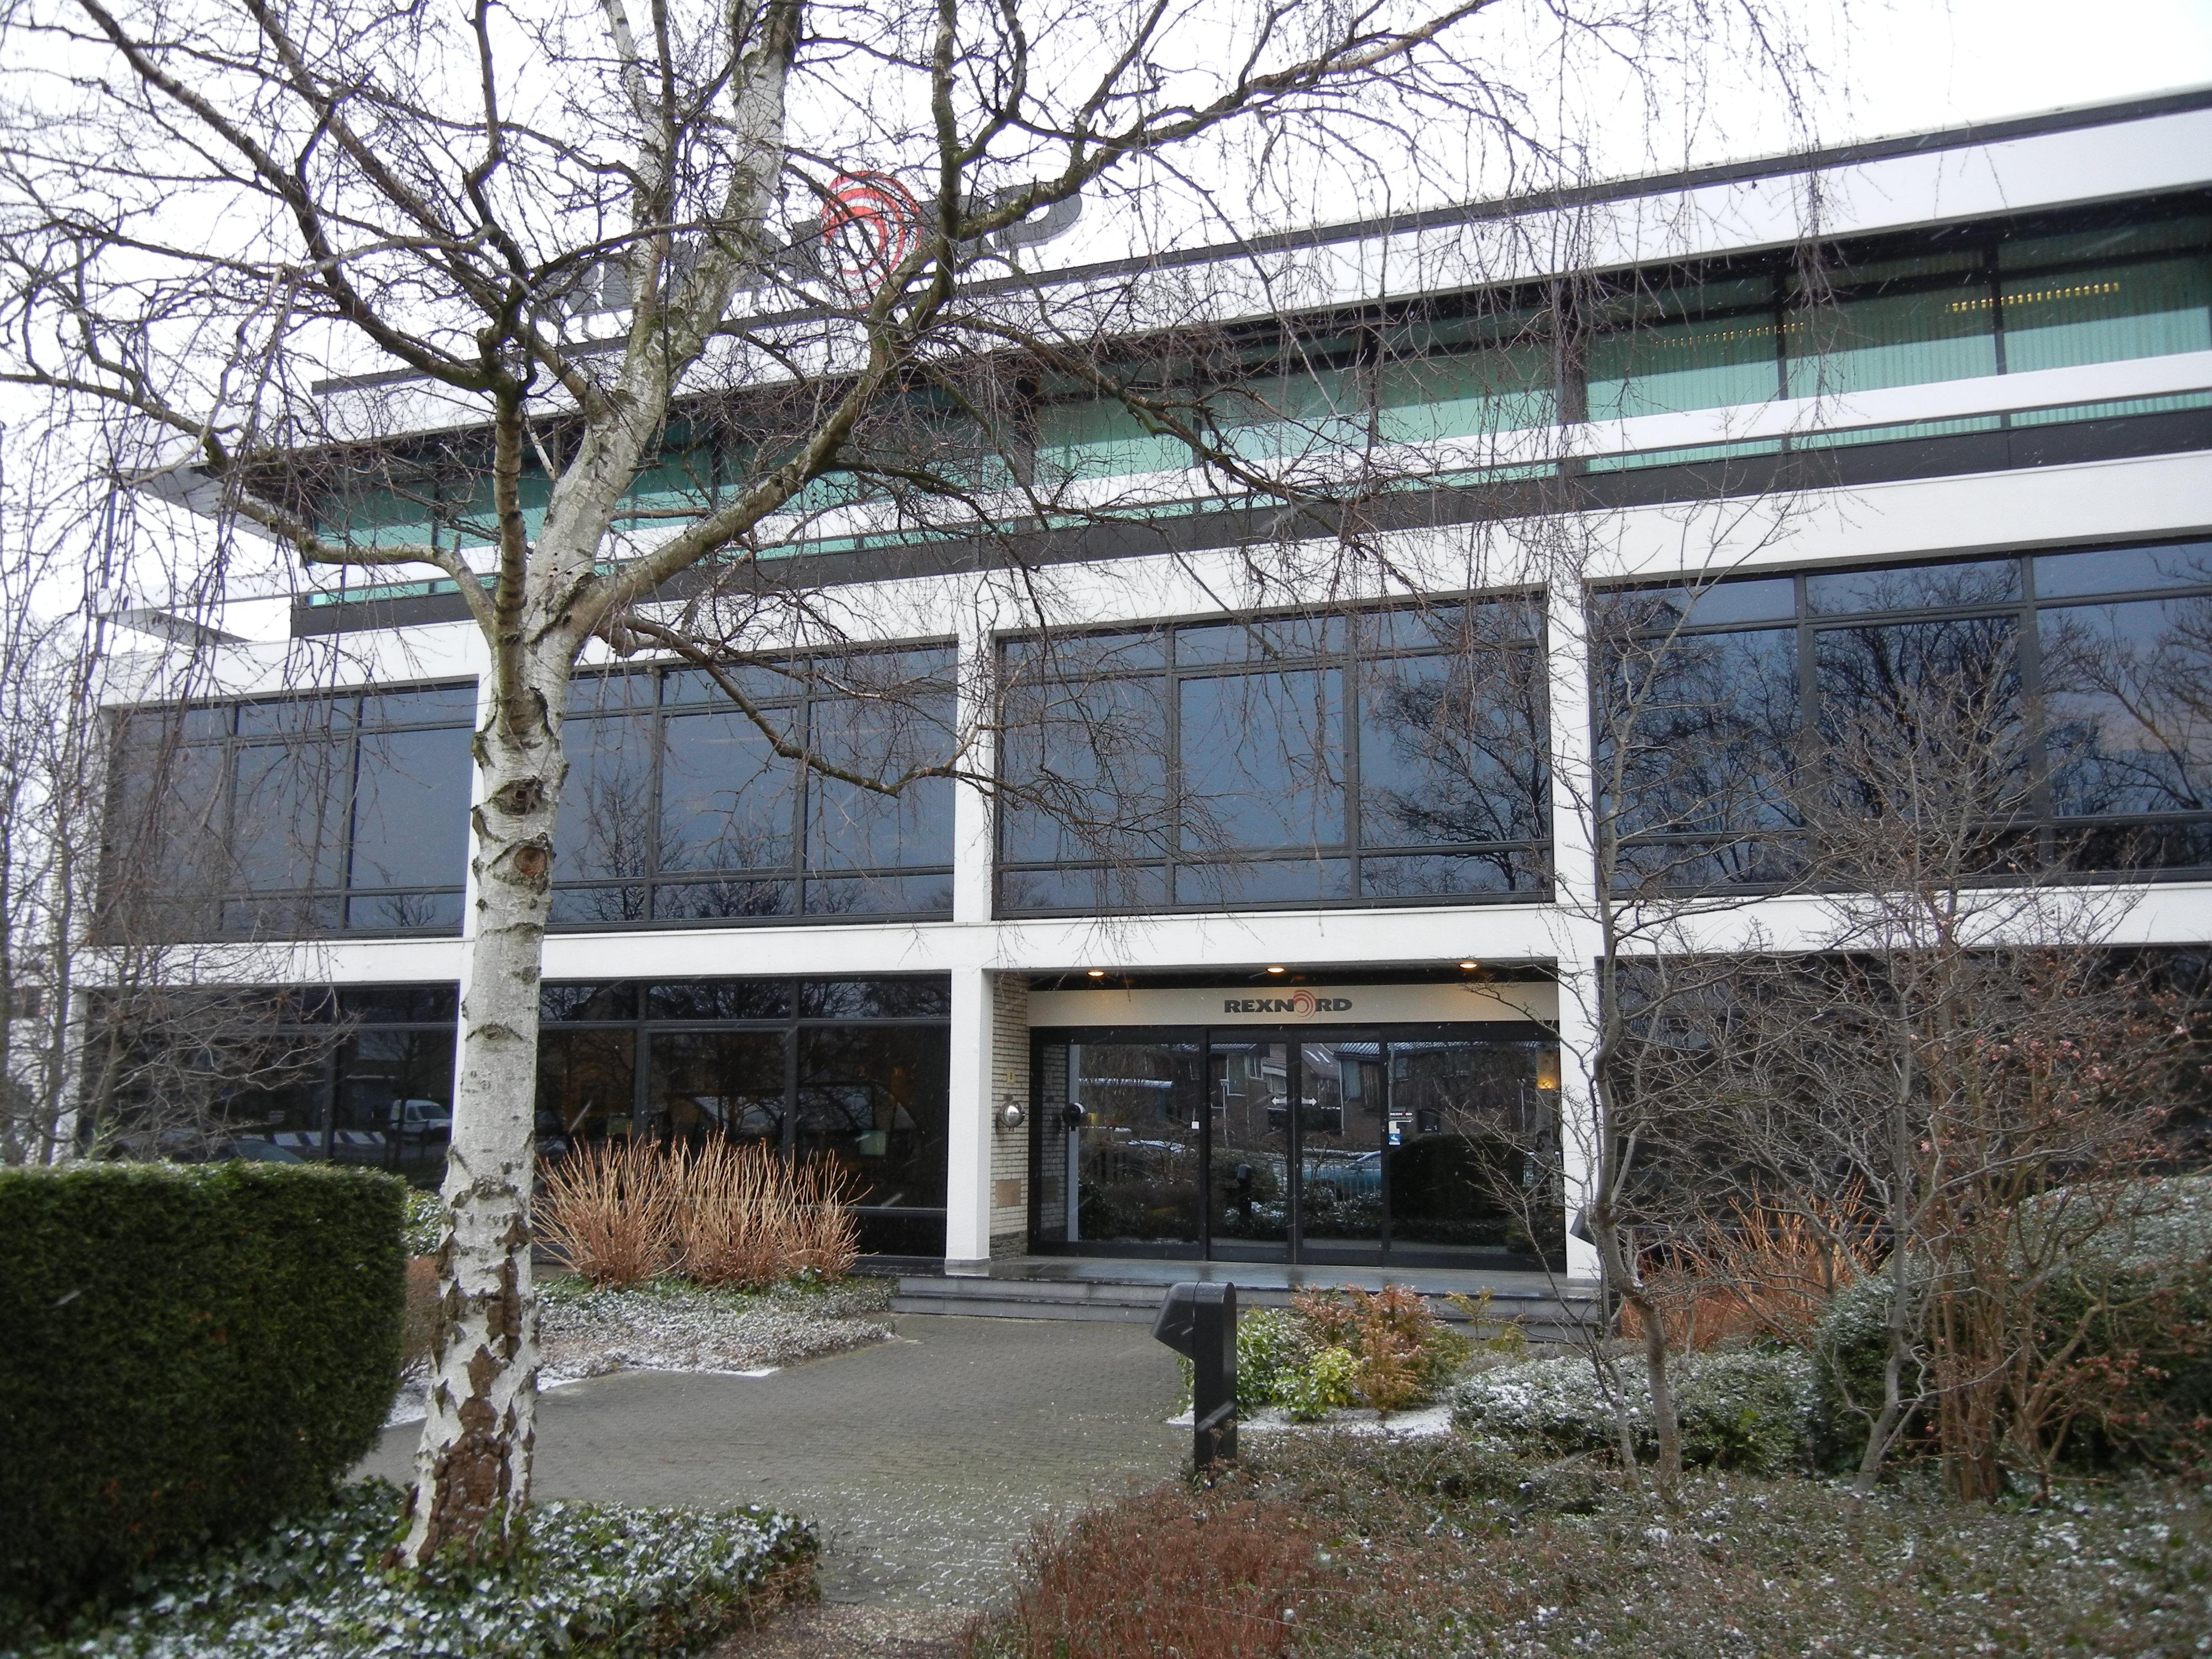 Maplewood International REIT's sole property in the Netherlands. (Photo: Maplewood International REIT)